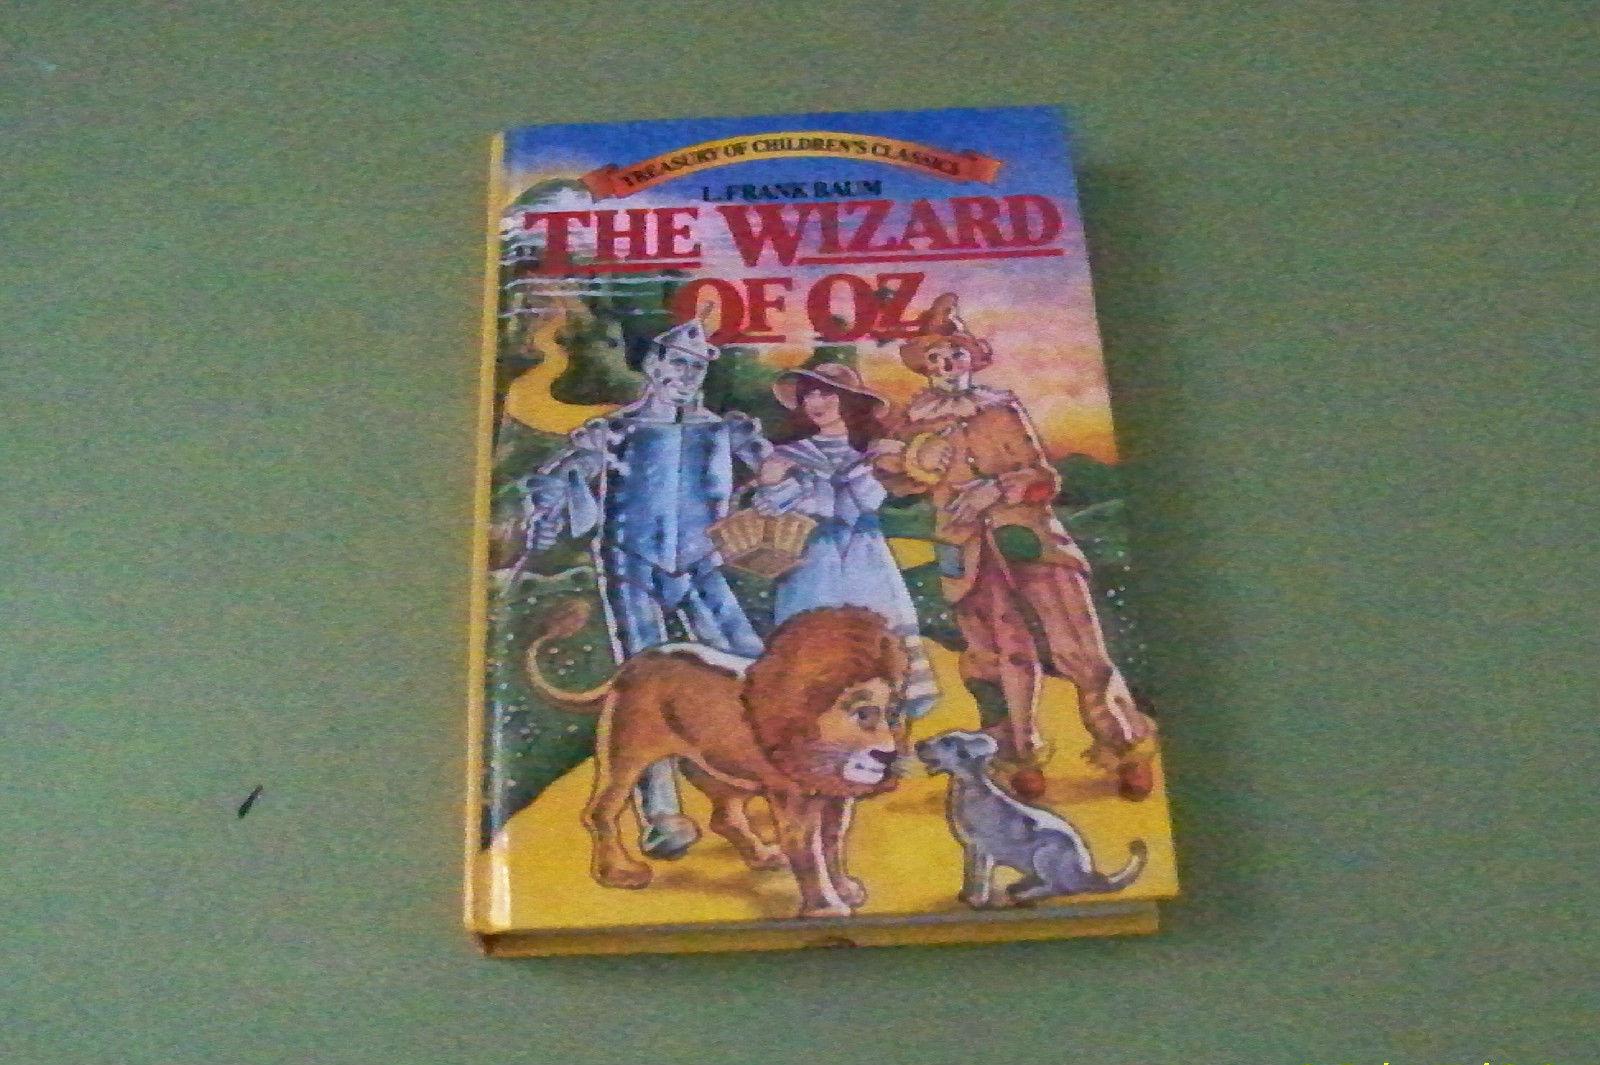 Vintage Book THE WIZARD OF OZ 1980 Treasury of Children's Classics